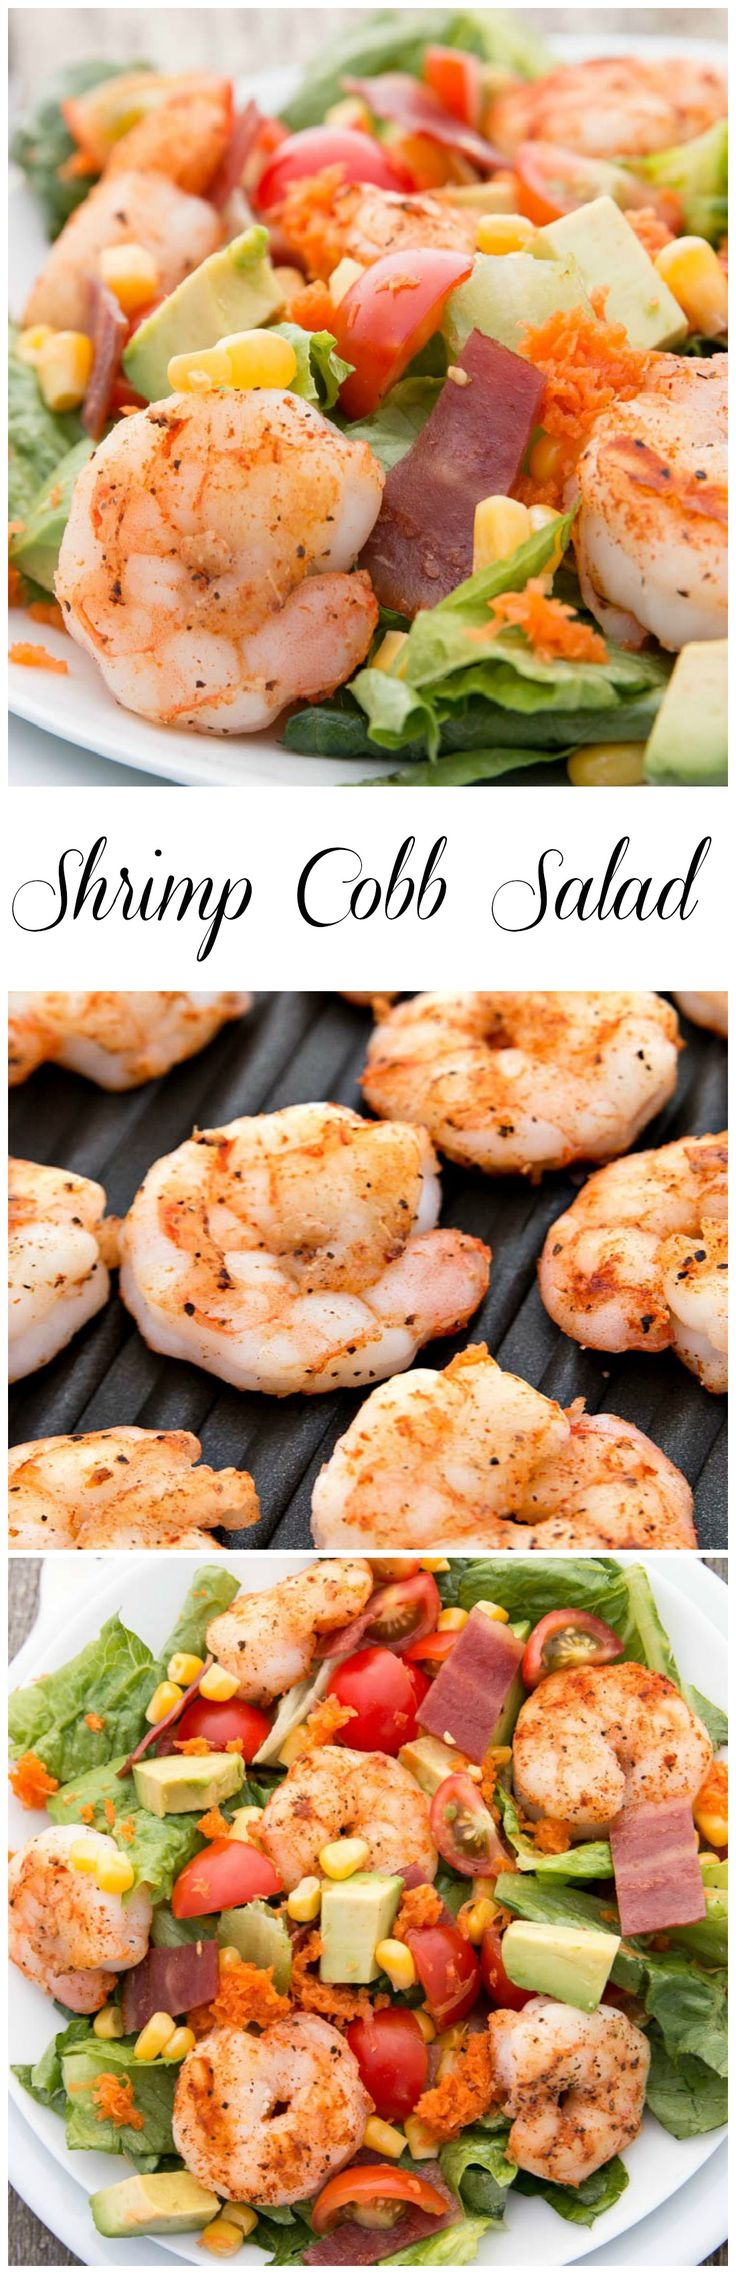 This Shrimp Cobb Salad is a sensational summer time salad